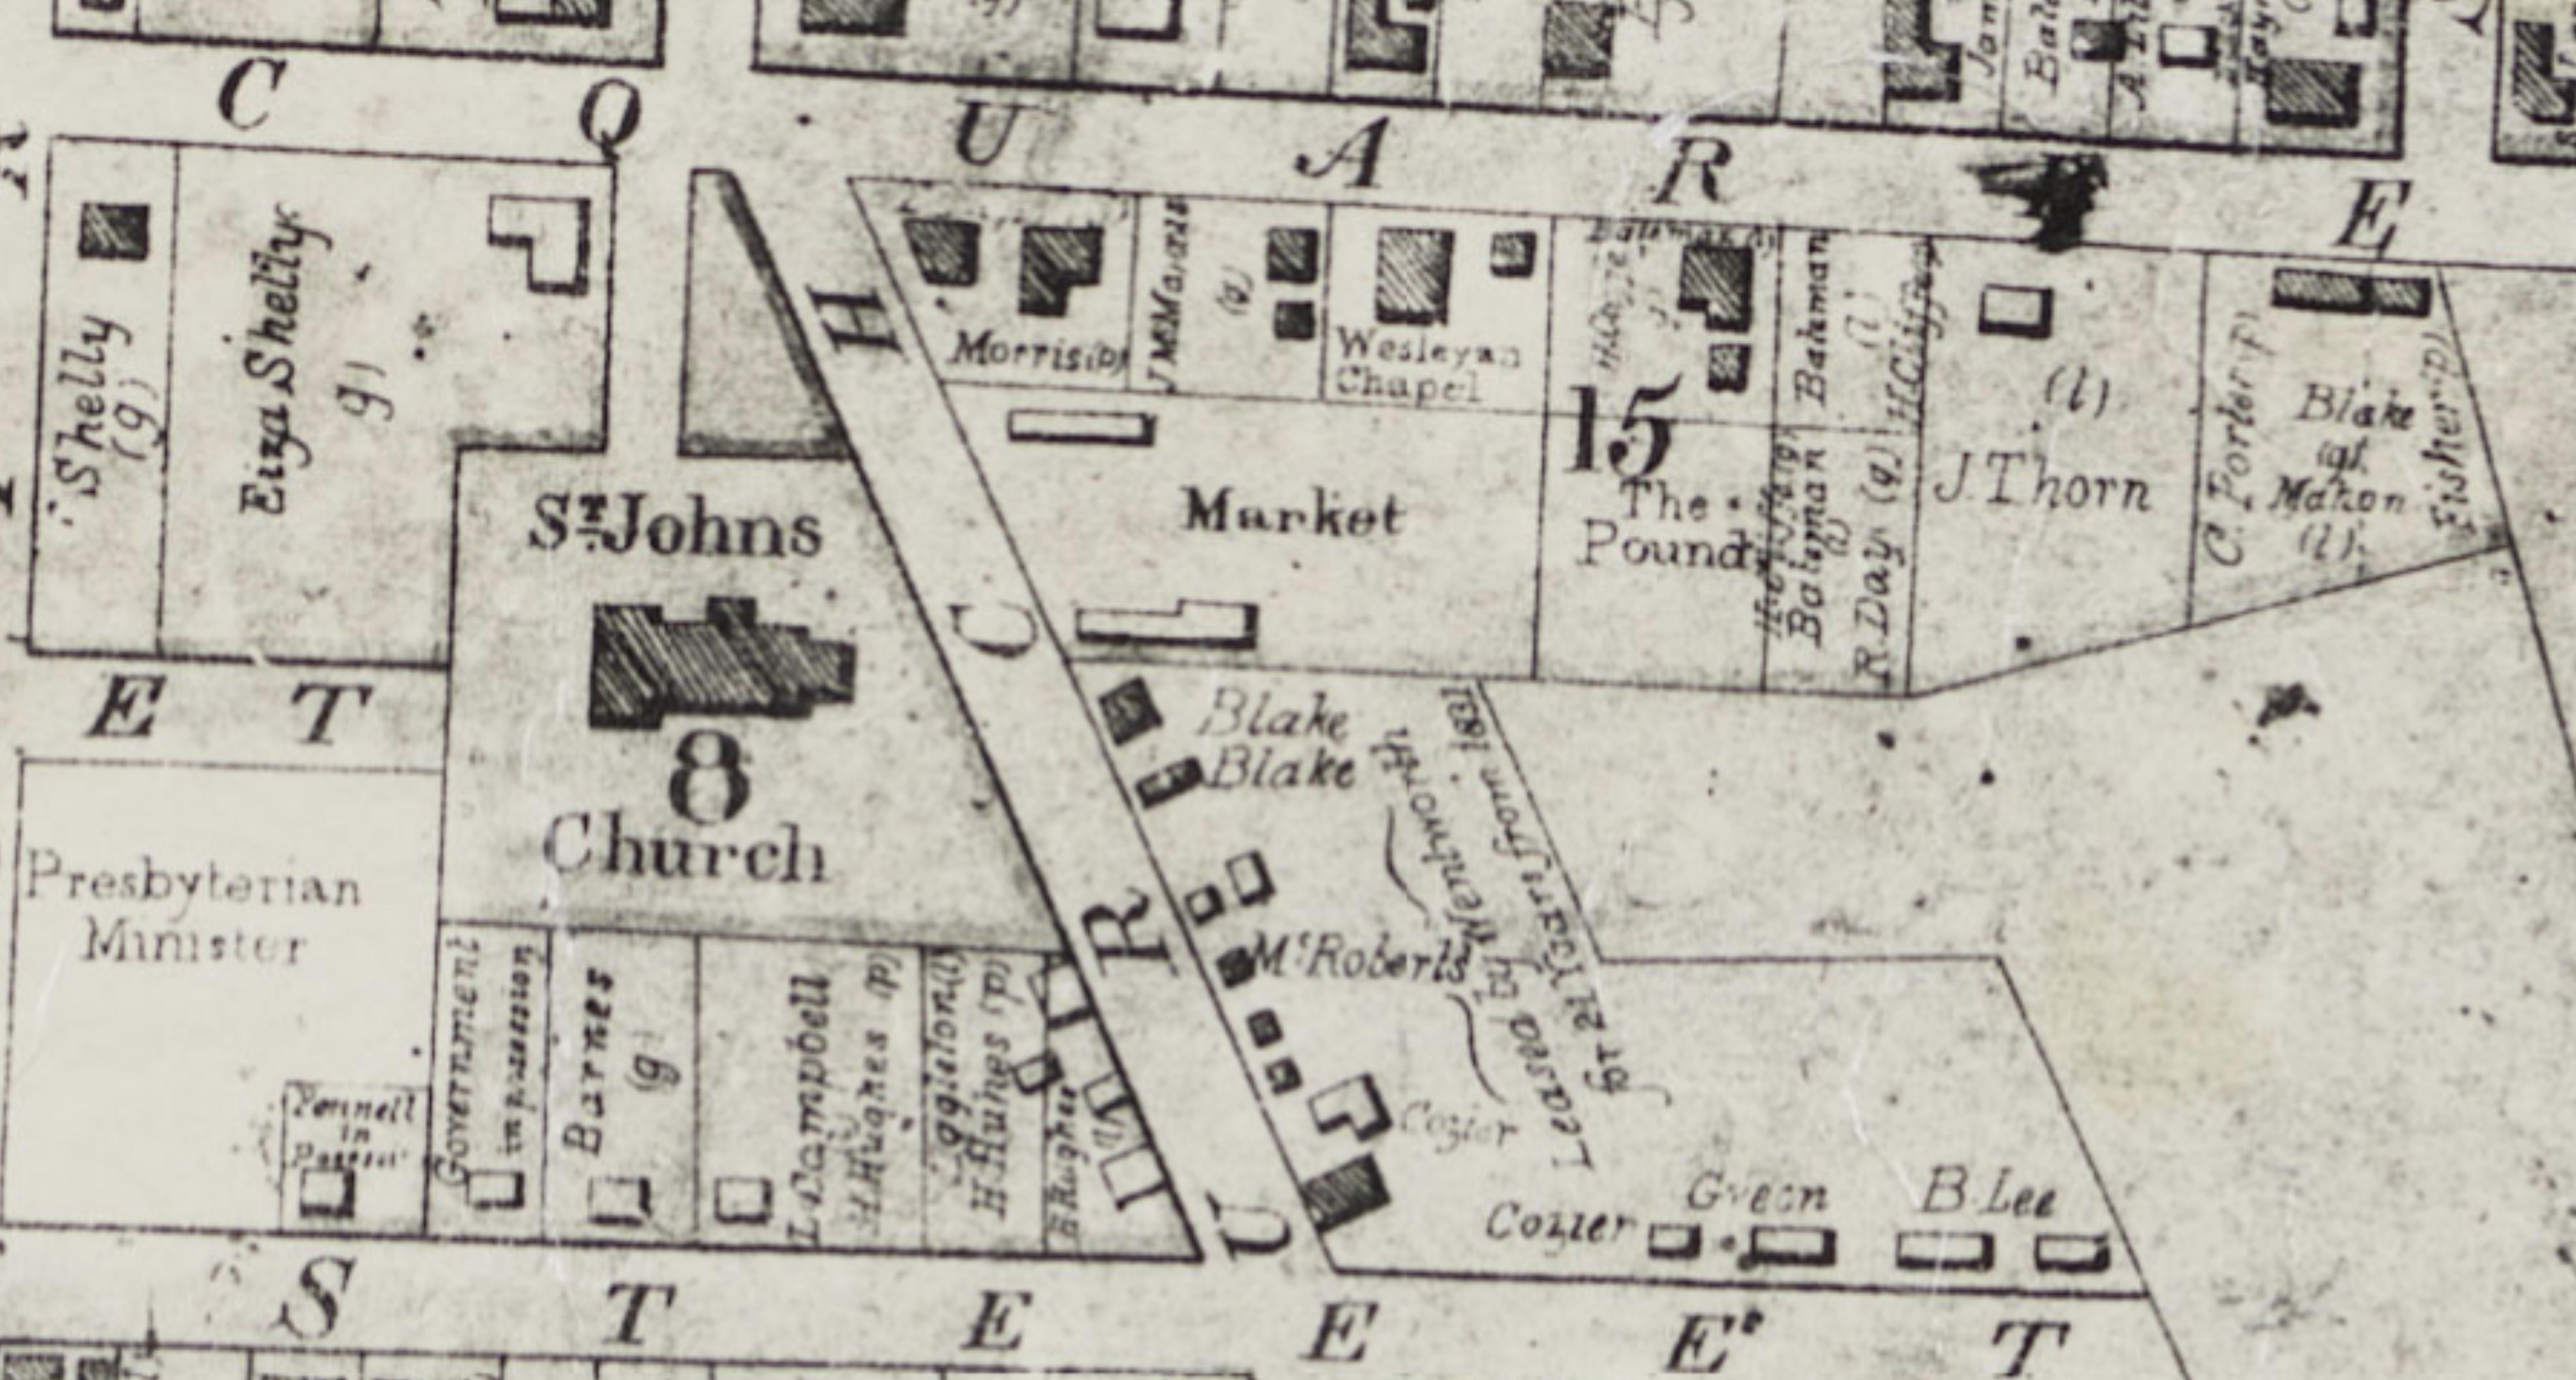 Plan of Parramatta 1844, Market Place, (Parramatta Town Hall), Jane Poole, Jane McManus, Macquarie Street, Parramatta, St. John's Cemetery Project, Old Parramattans, St. John's First Fleeters, First Fleet convict